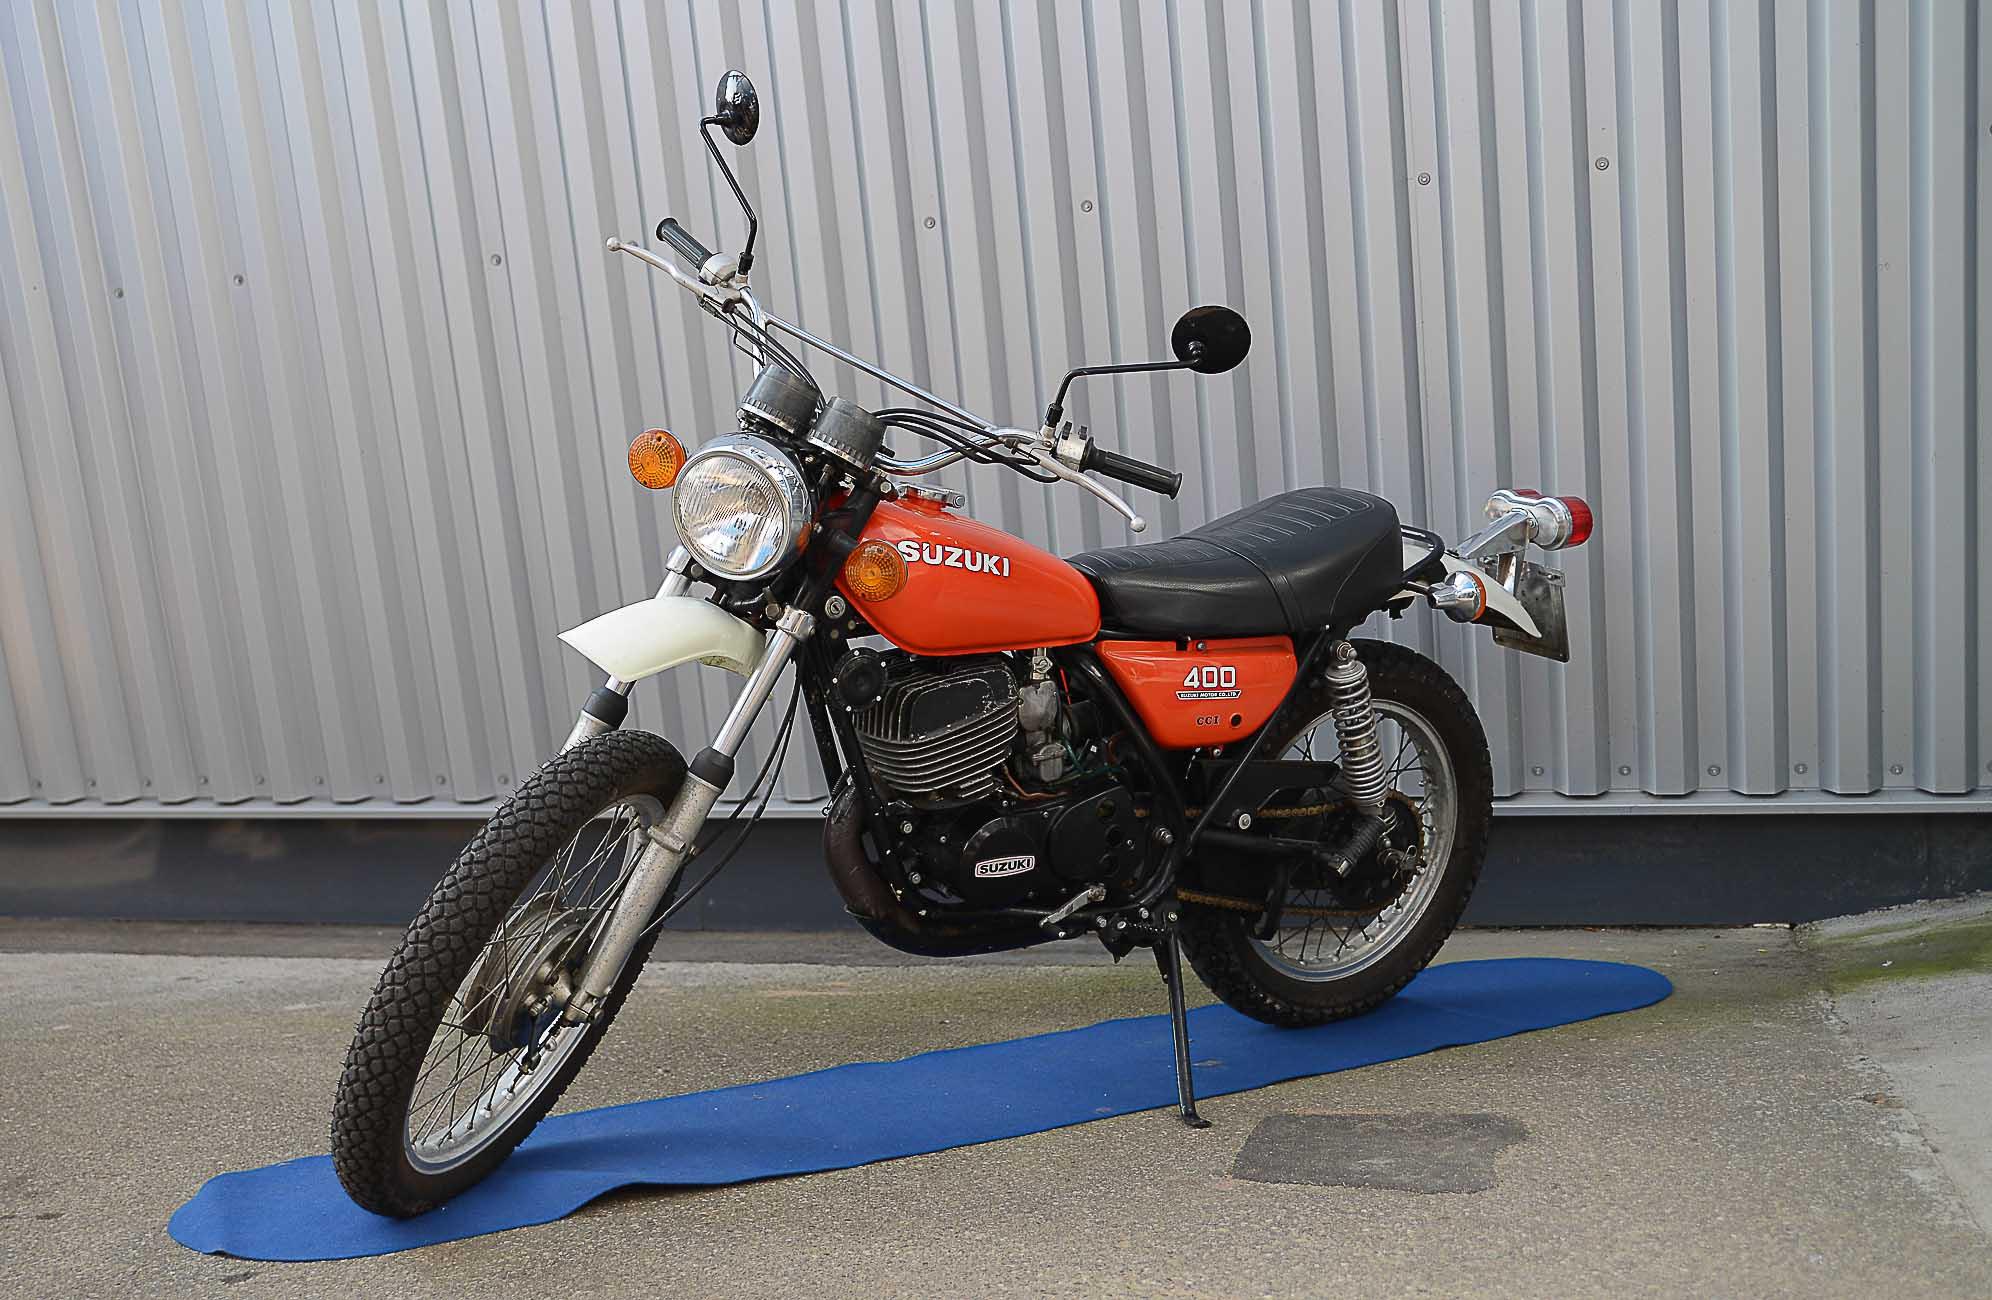 SUZUKI TS 400 (1972 - 1977)